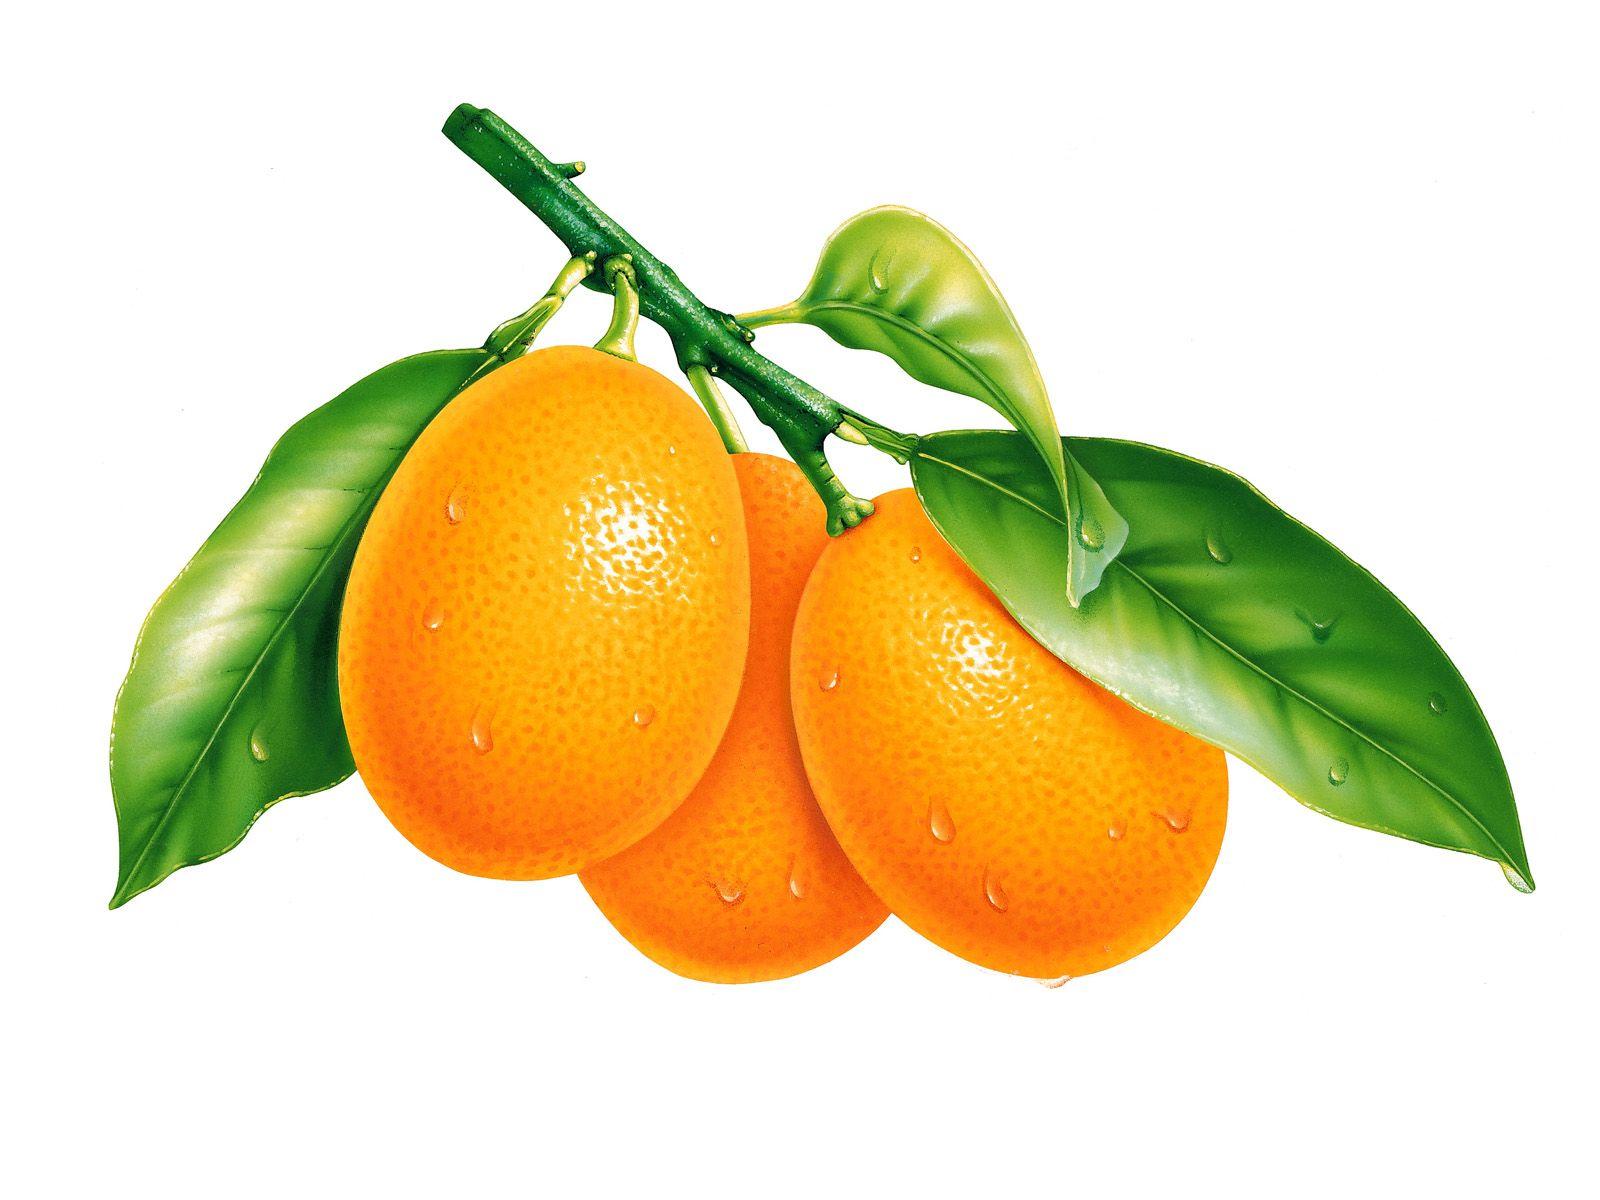 Or orange fruit hd wallpaper - Download Widescreen Lemon Fruit Hd Wallpaper Free